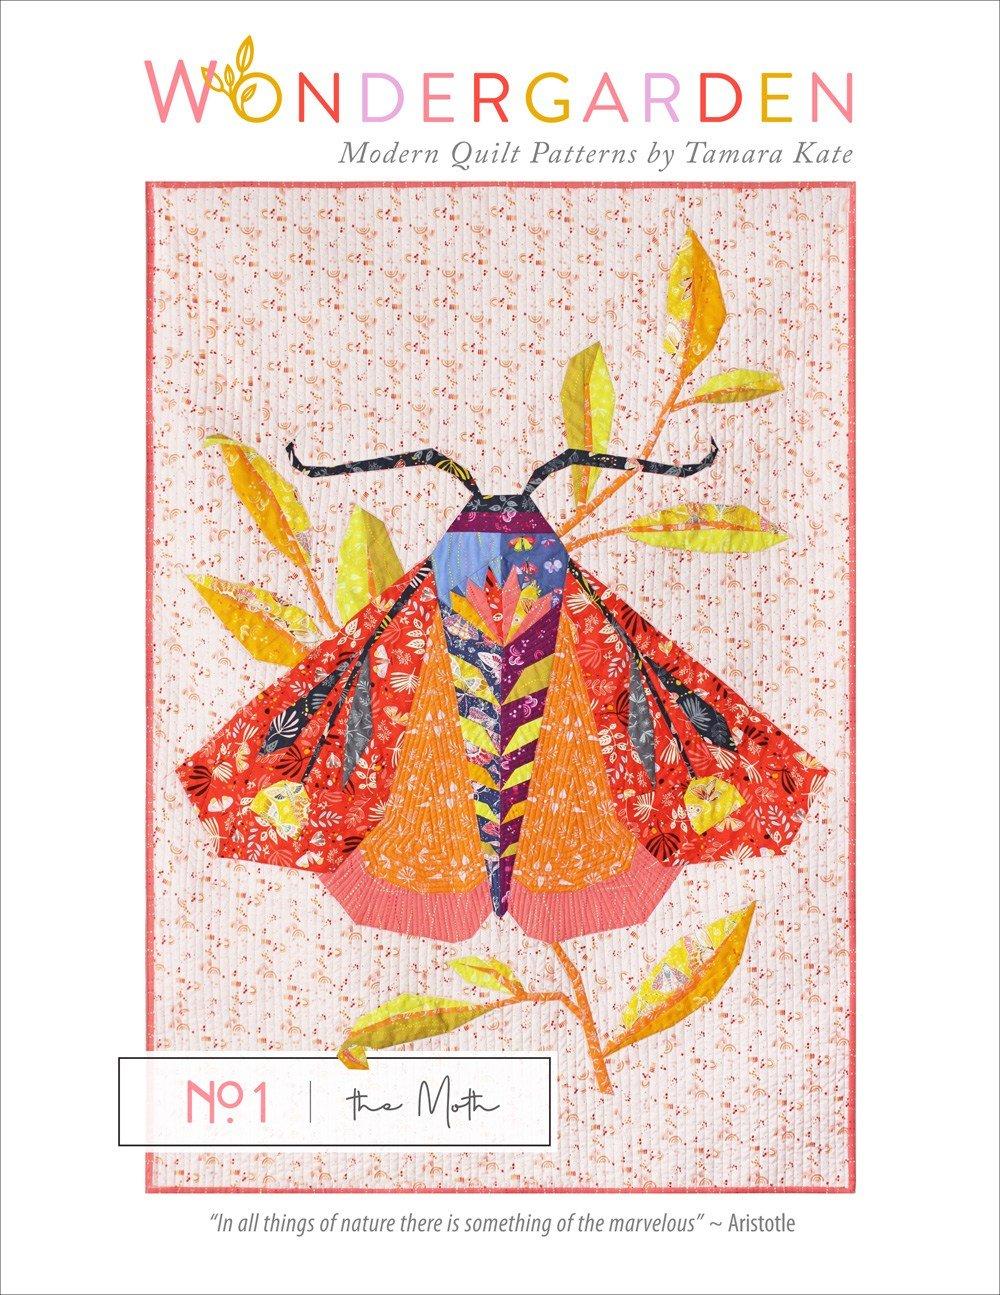 WonderGarden No. 1 the Moth by Tamara Kate